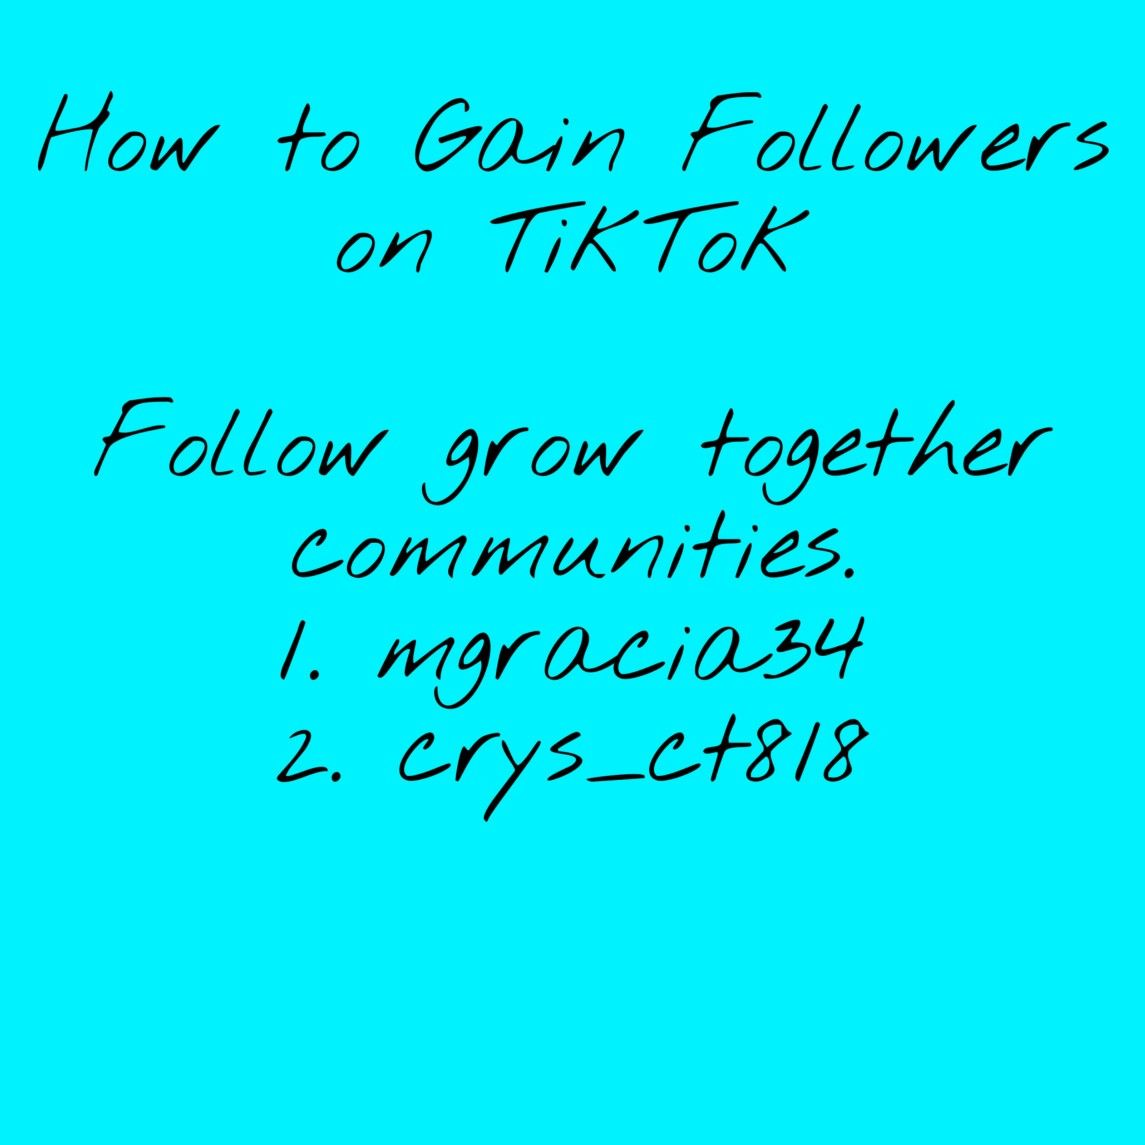 How To Gain Tiktok Followers Gain Followers Grow Together Gain